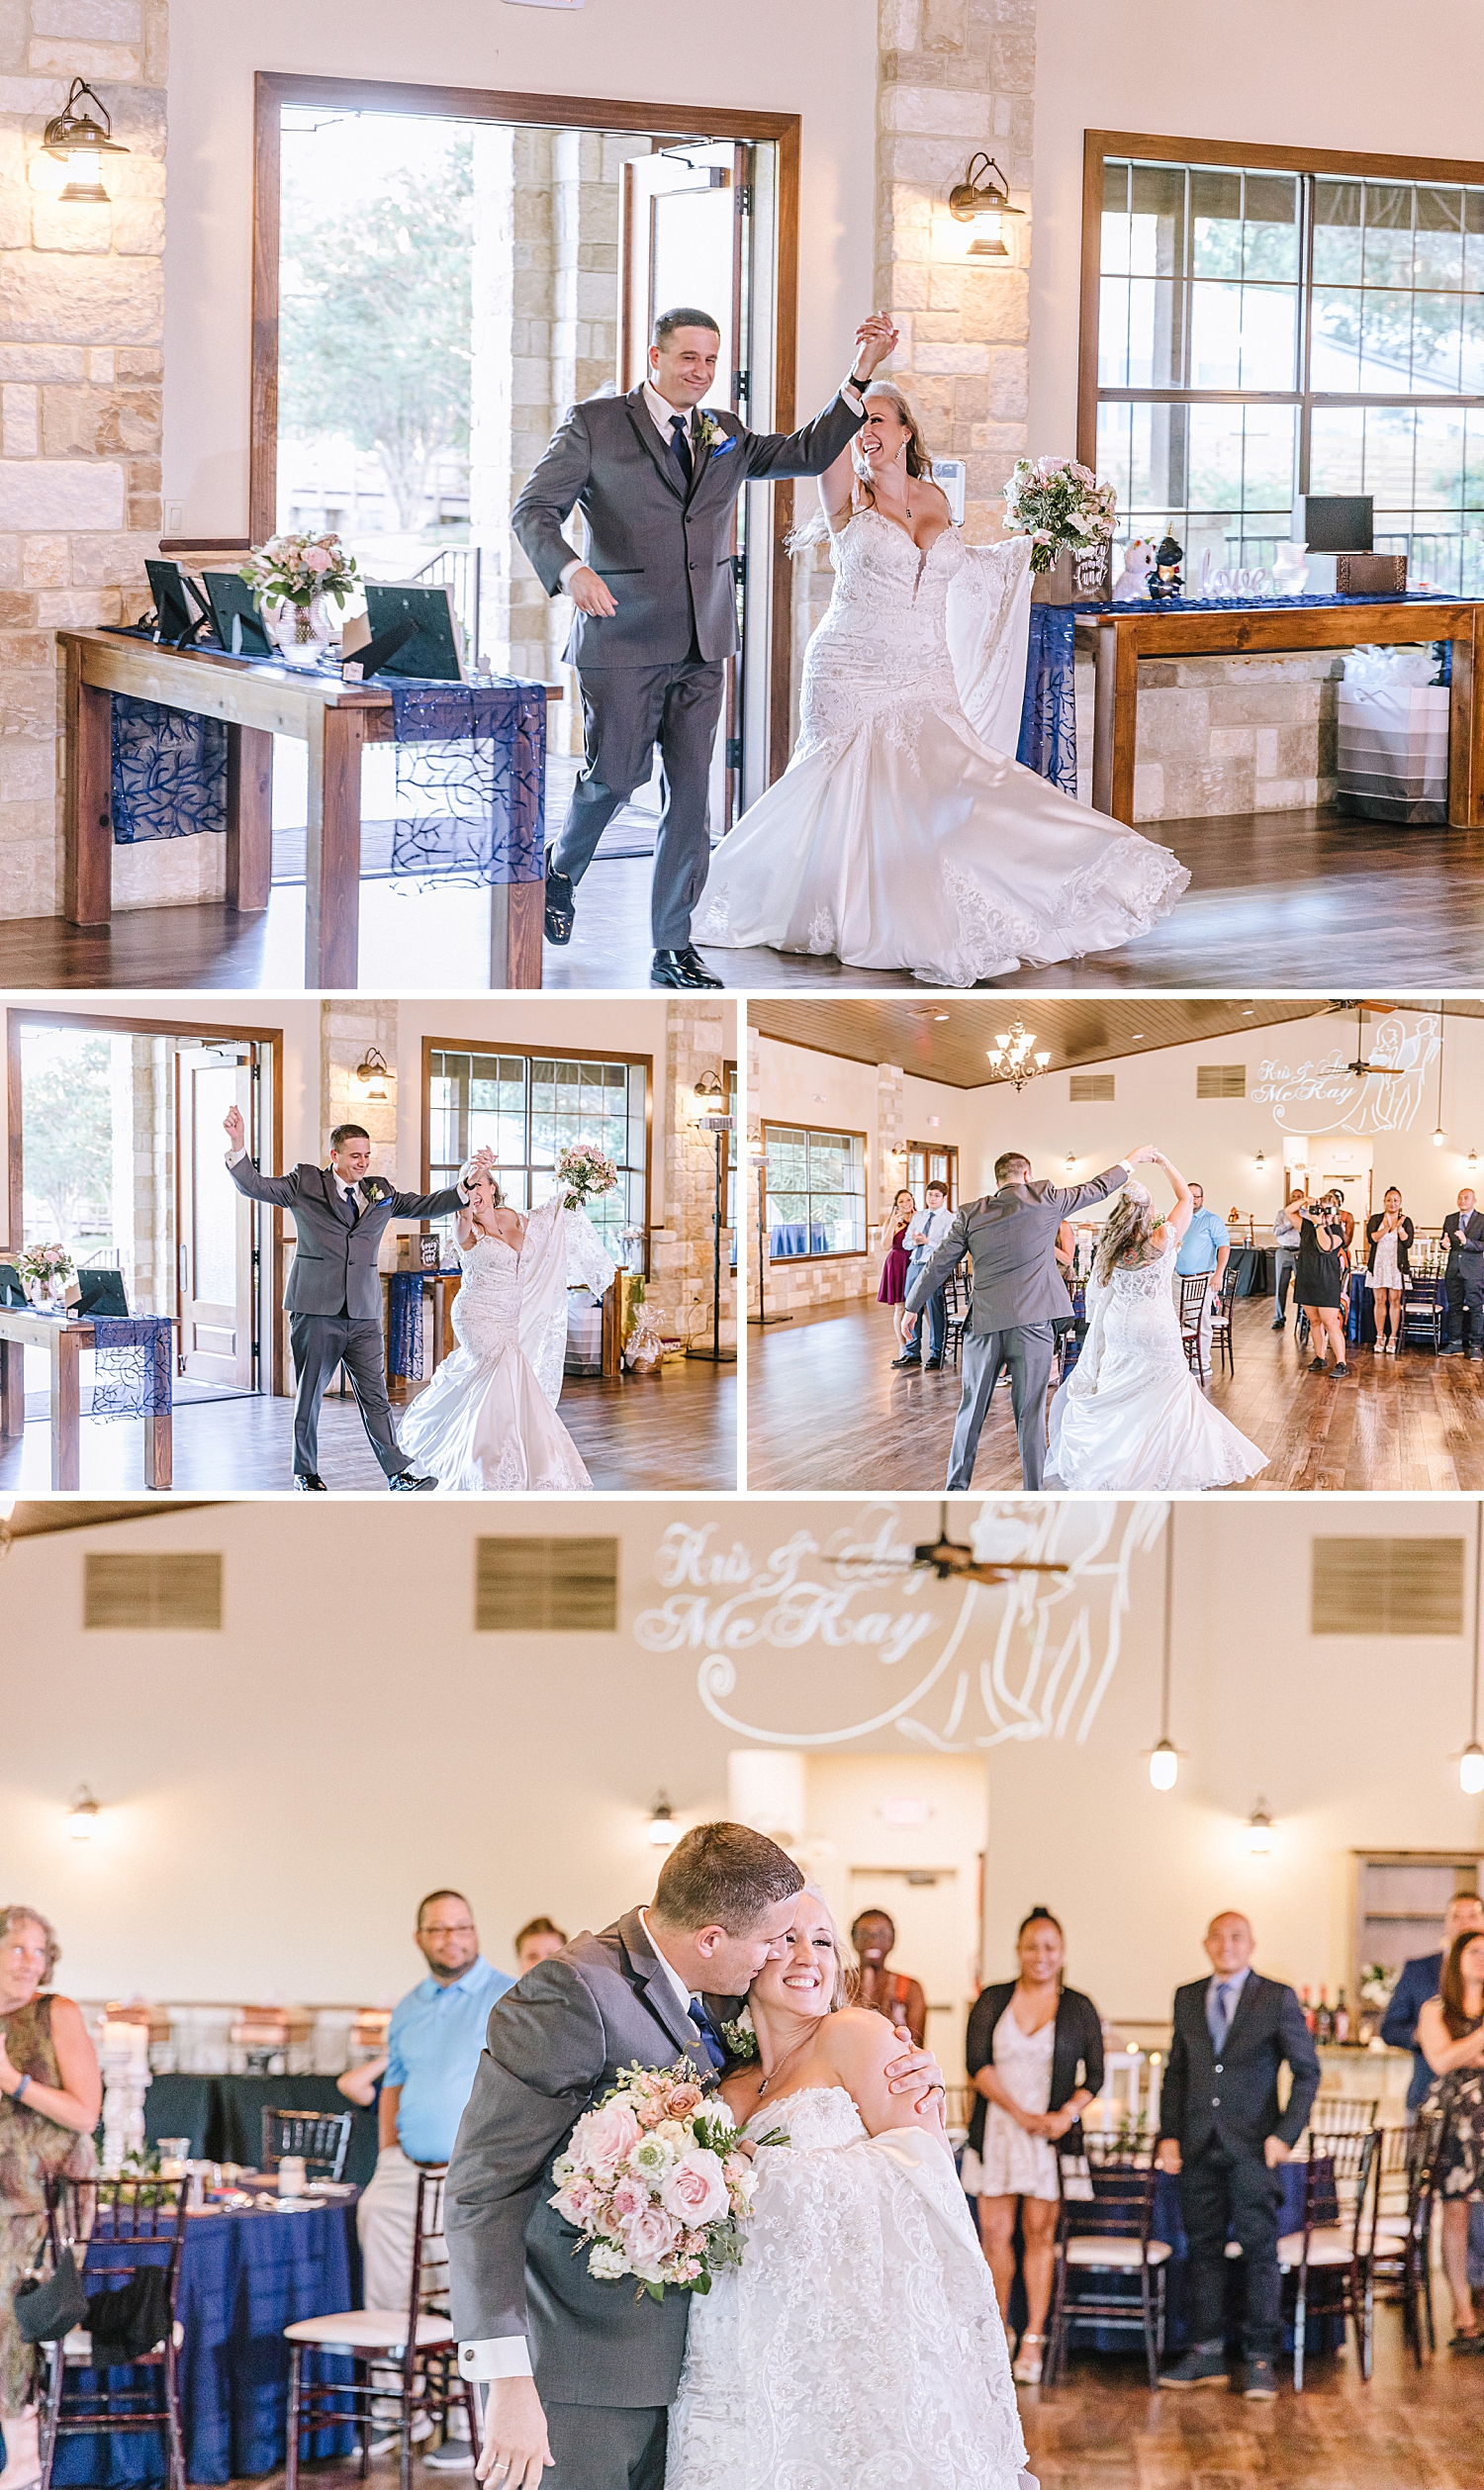 The-Club-at-Garden-Ridge-Military-Wedding-Carly-Barton-Photography_0086.jpg